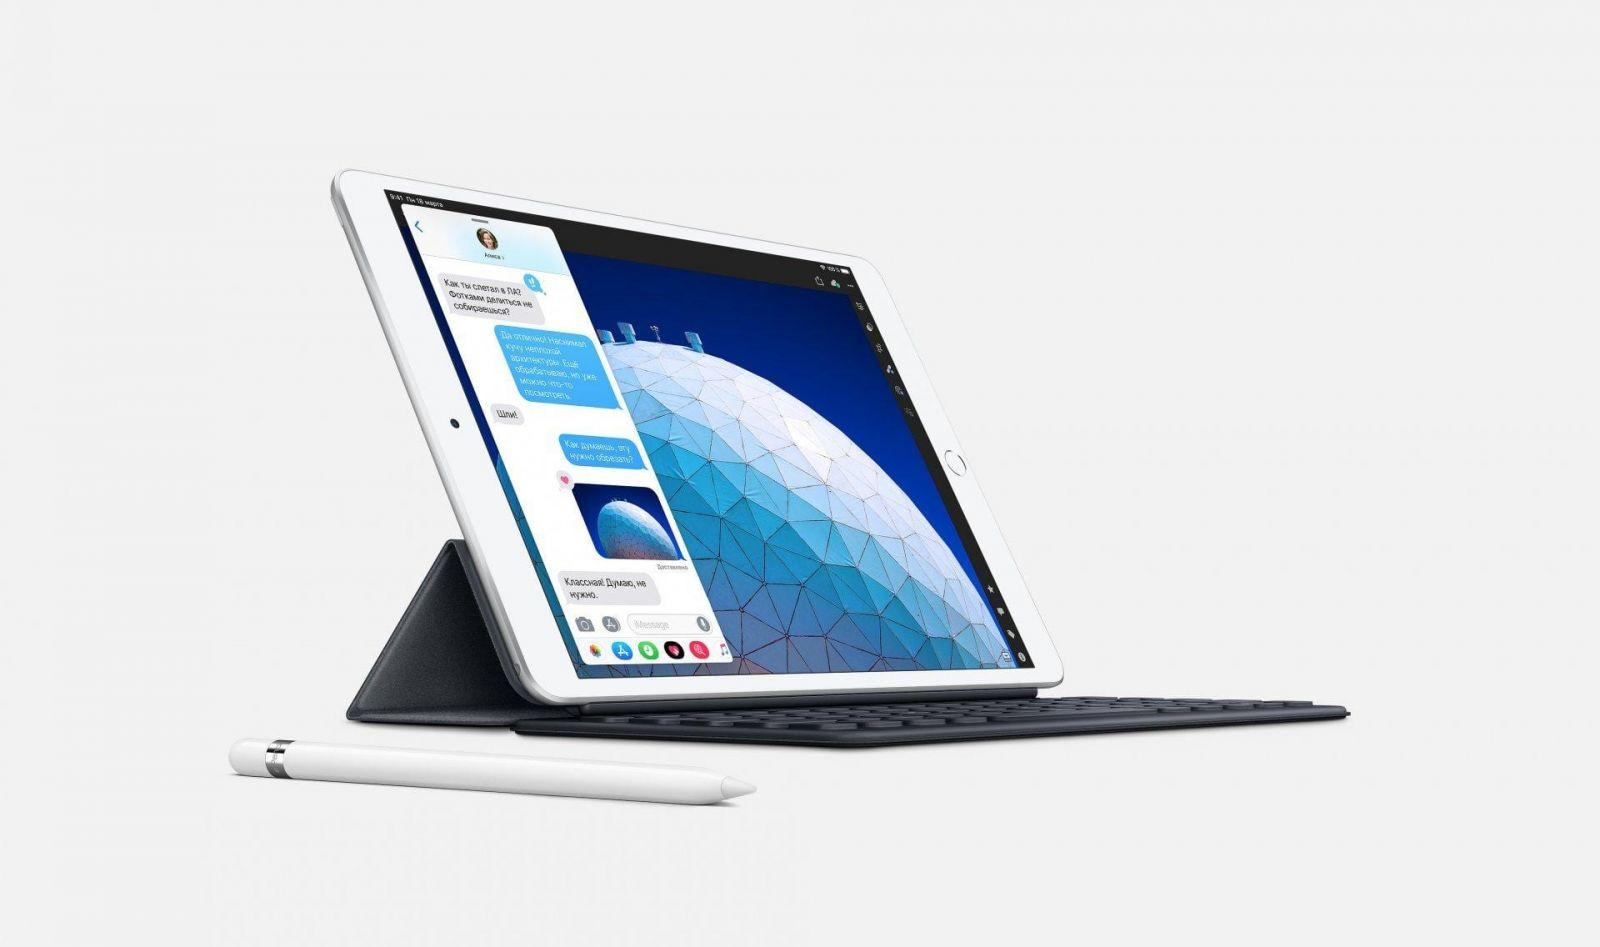 Apple неожиданно представила новый iPad Air и iPad mini c процессором A12 (ipad air gallery 1 geo ru)